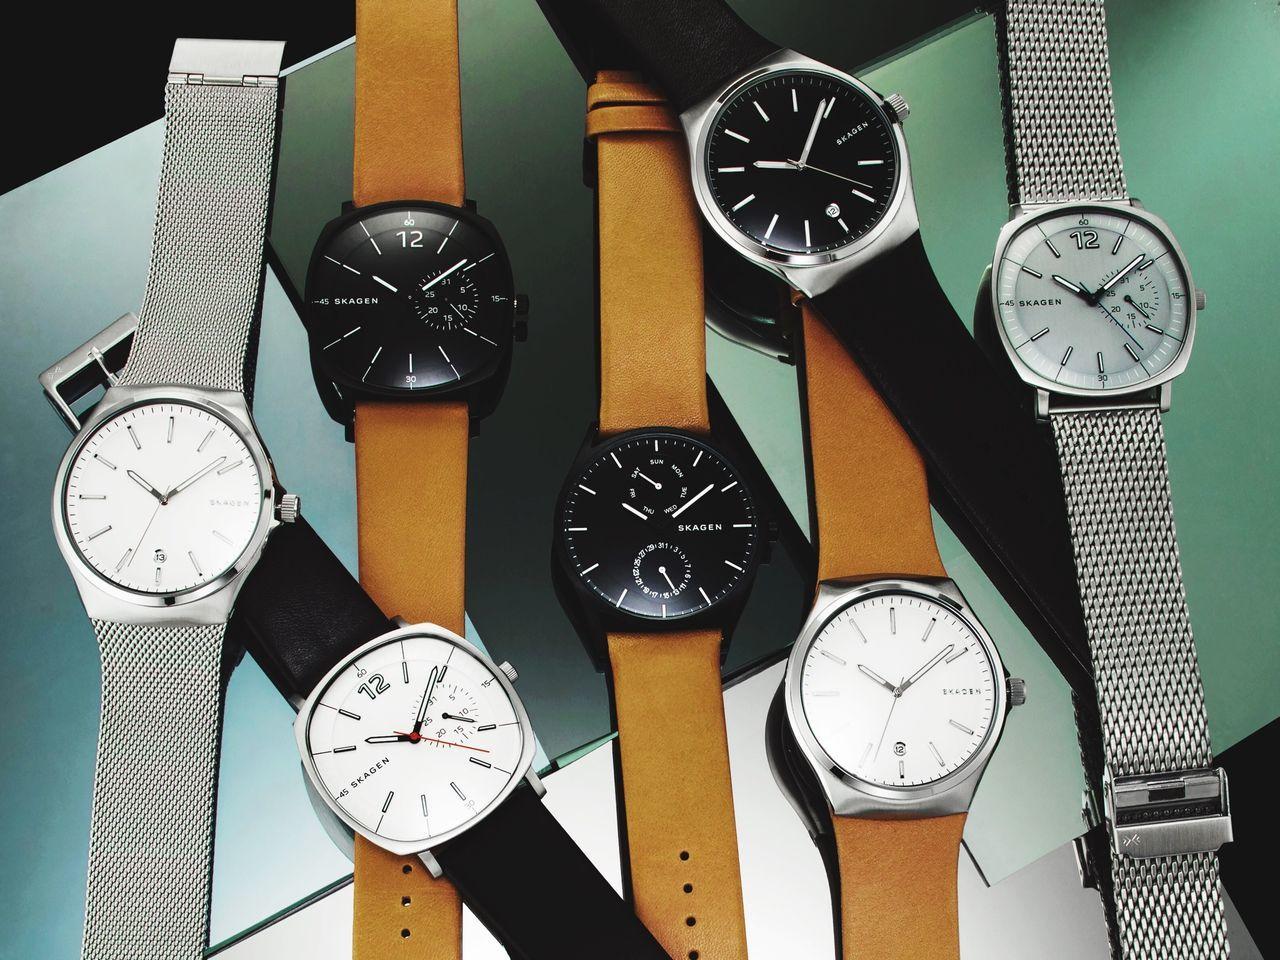 Beautiful stock photos of uhren, time, clock, roman numeral, clock face